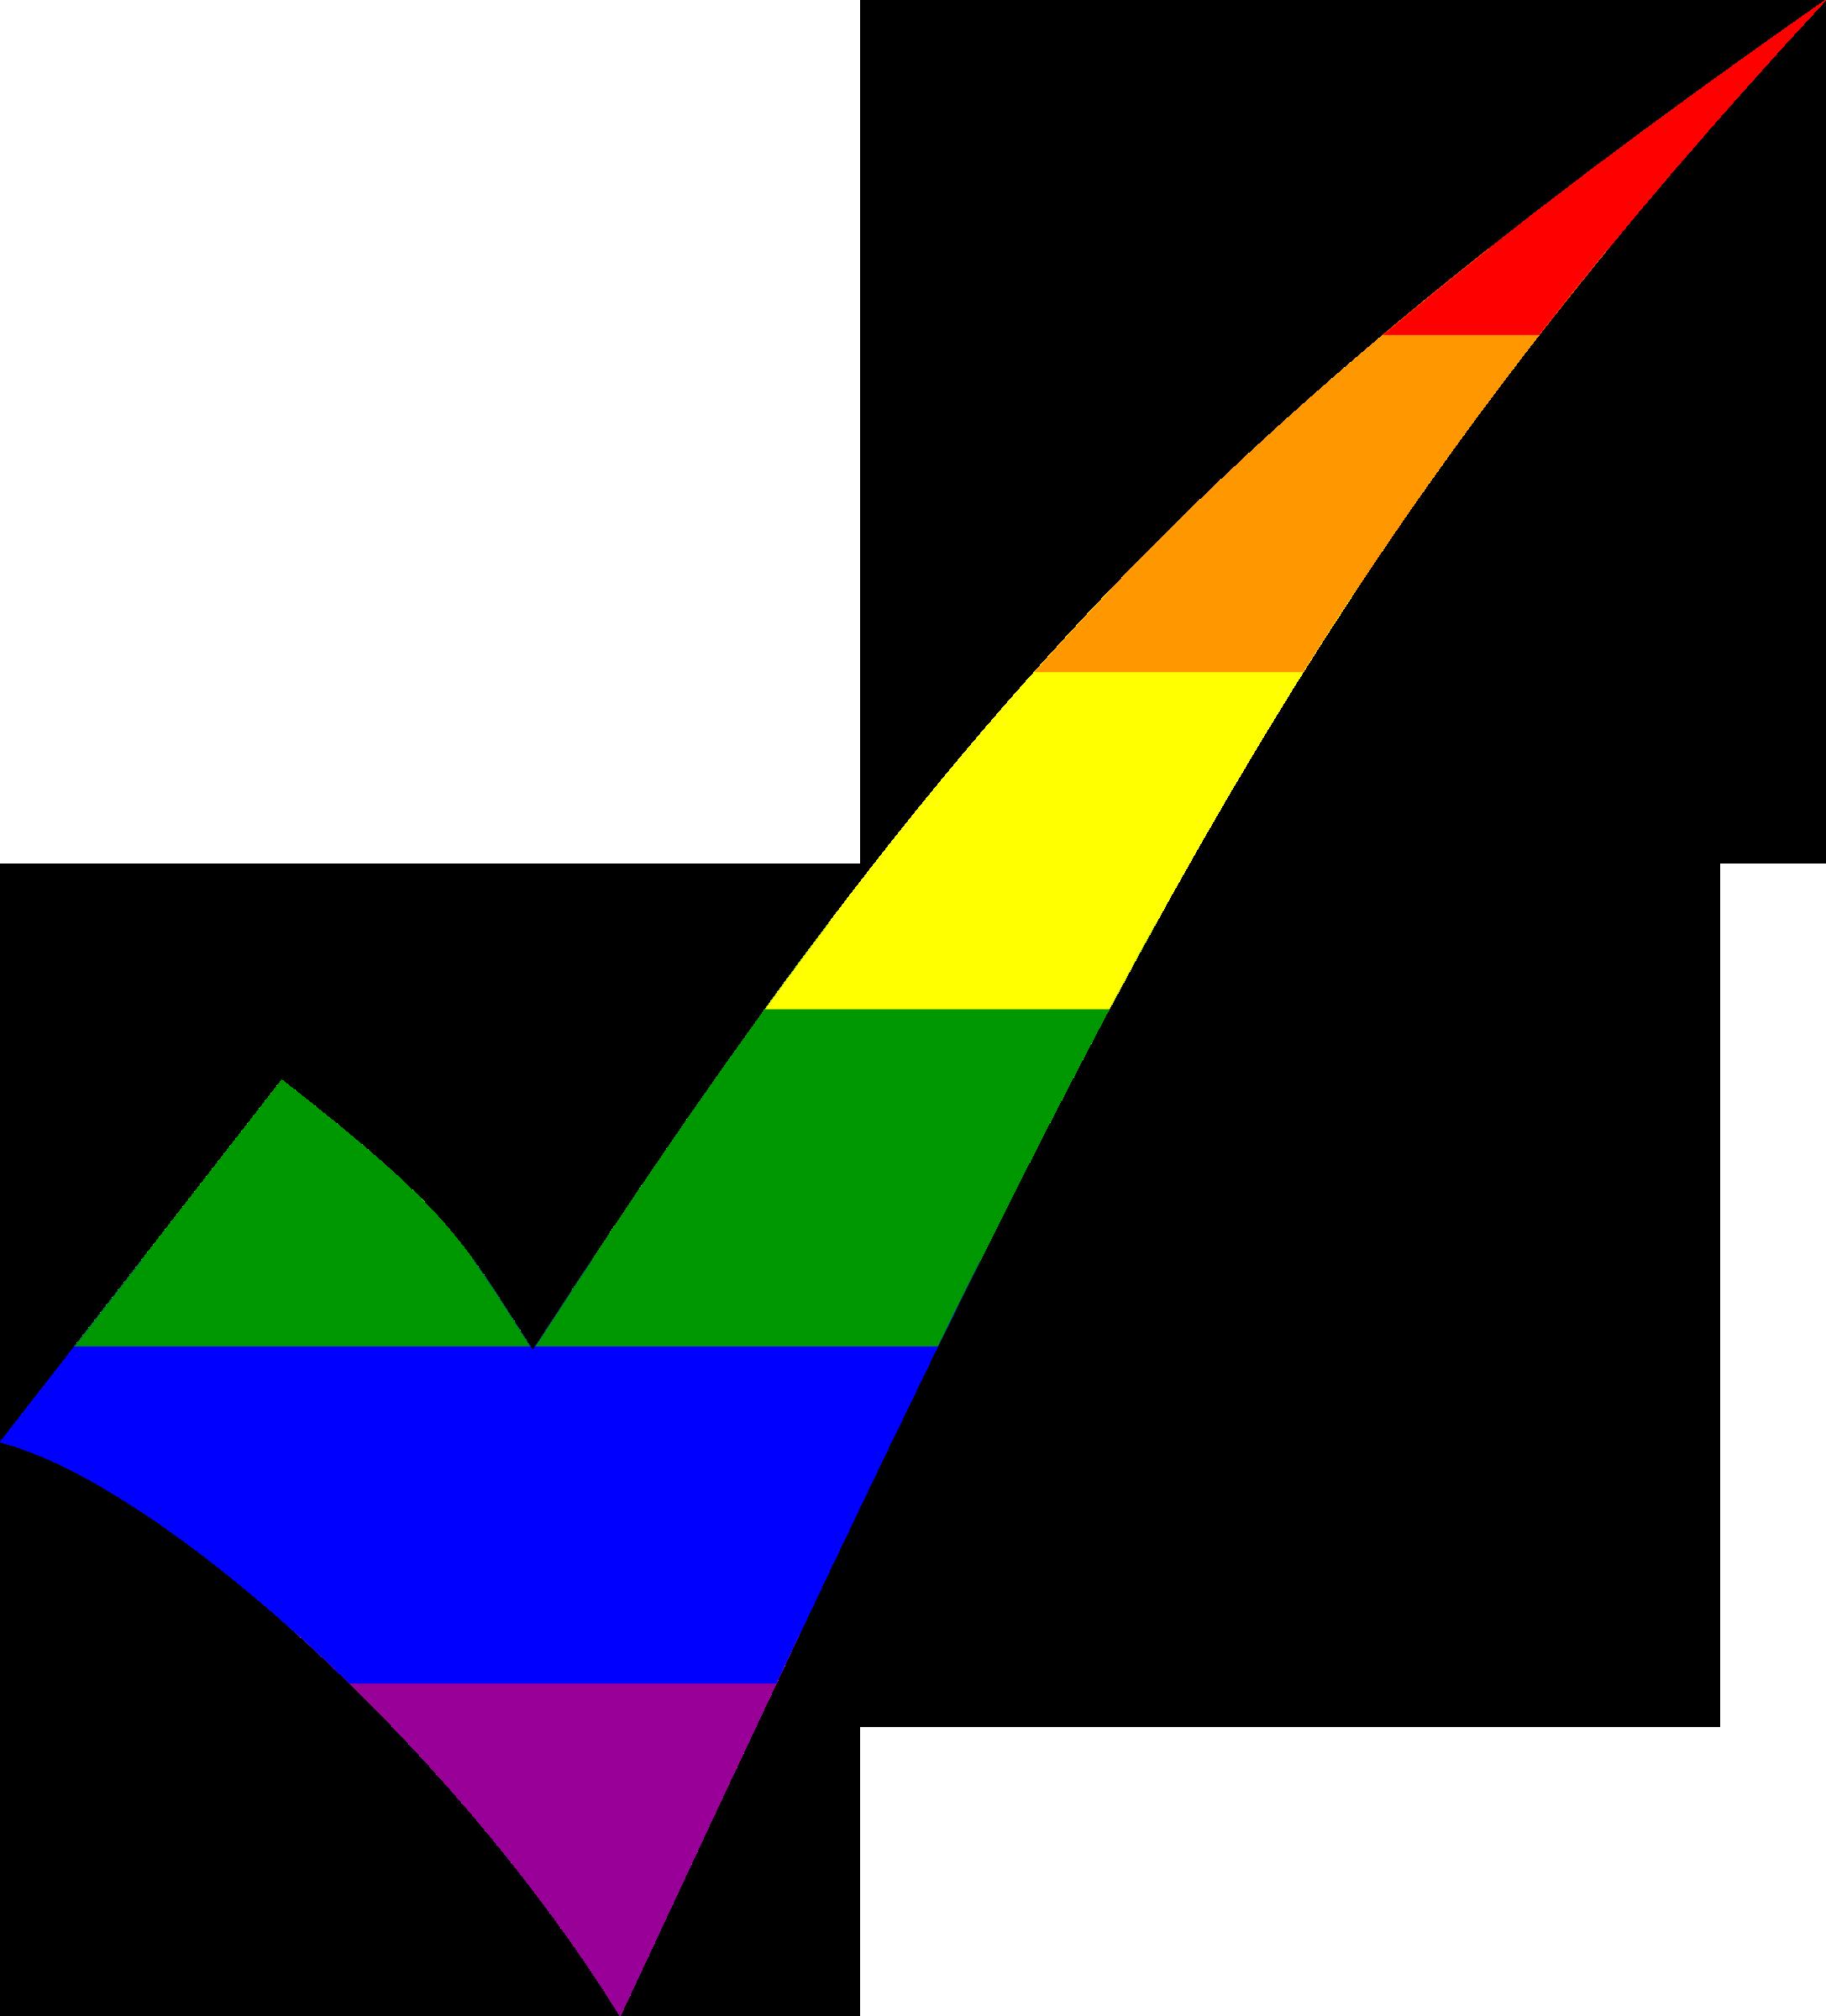 Rainbow Check Vector Clipart Image Free Stock Photo Public Domain Photo Cc0 Images